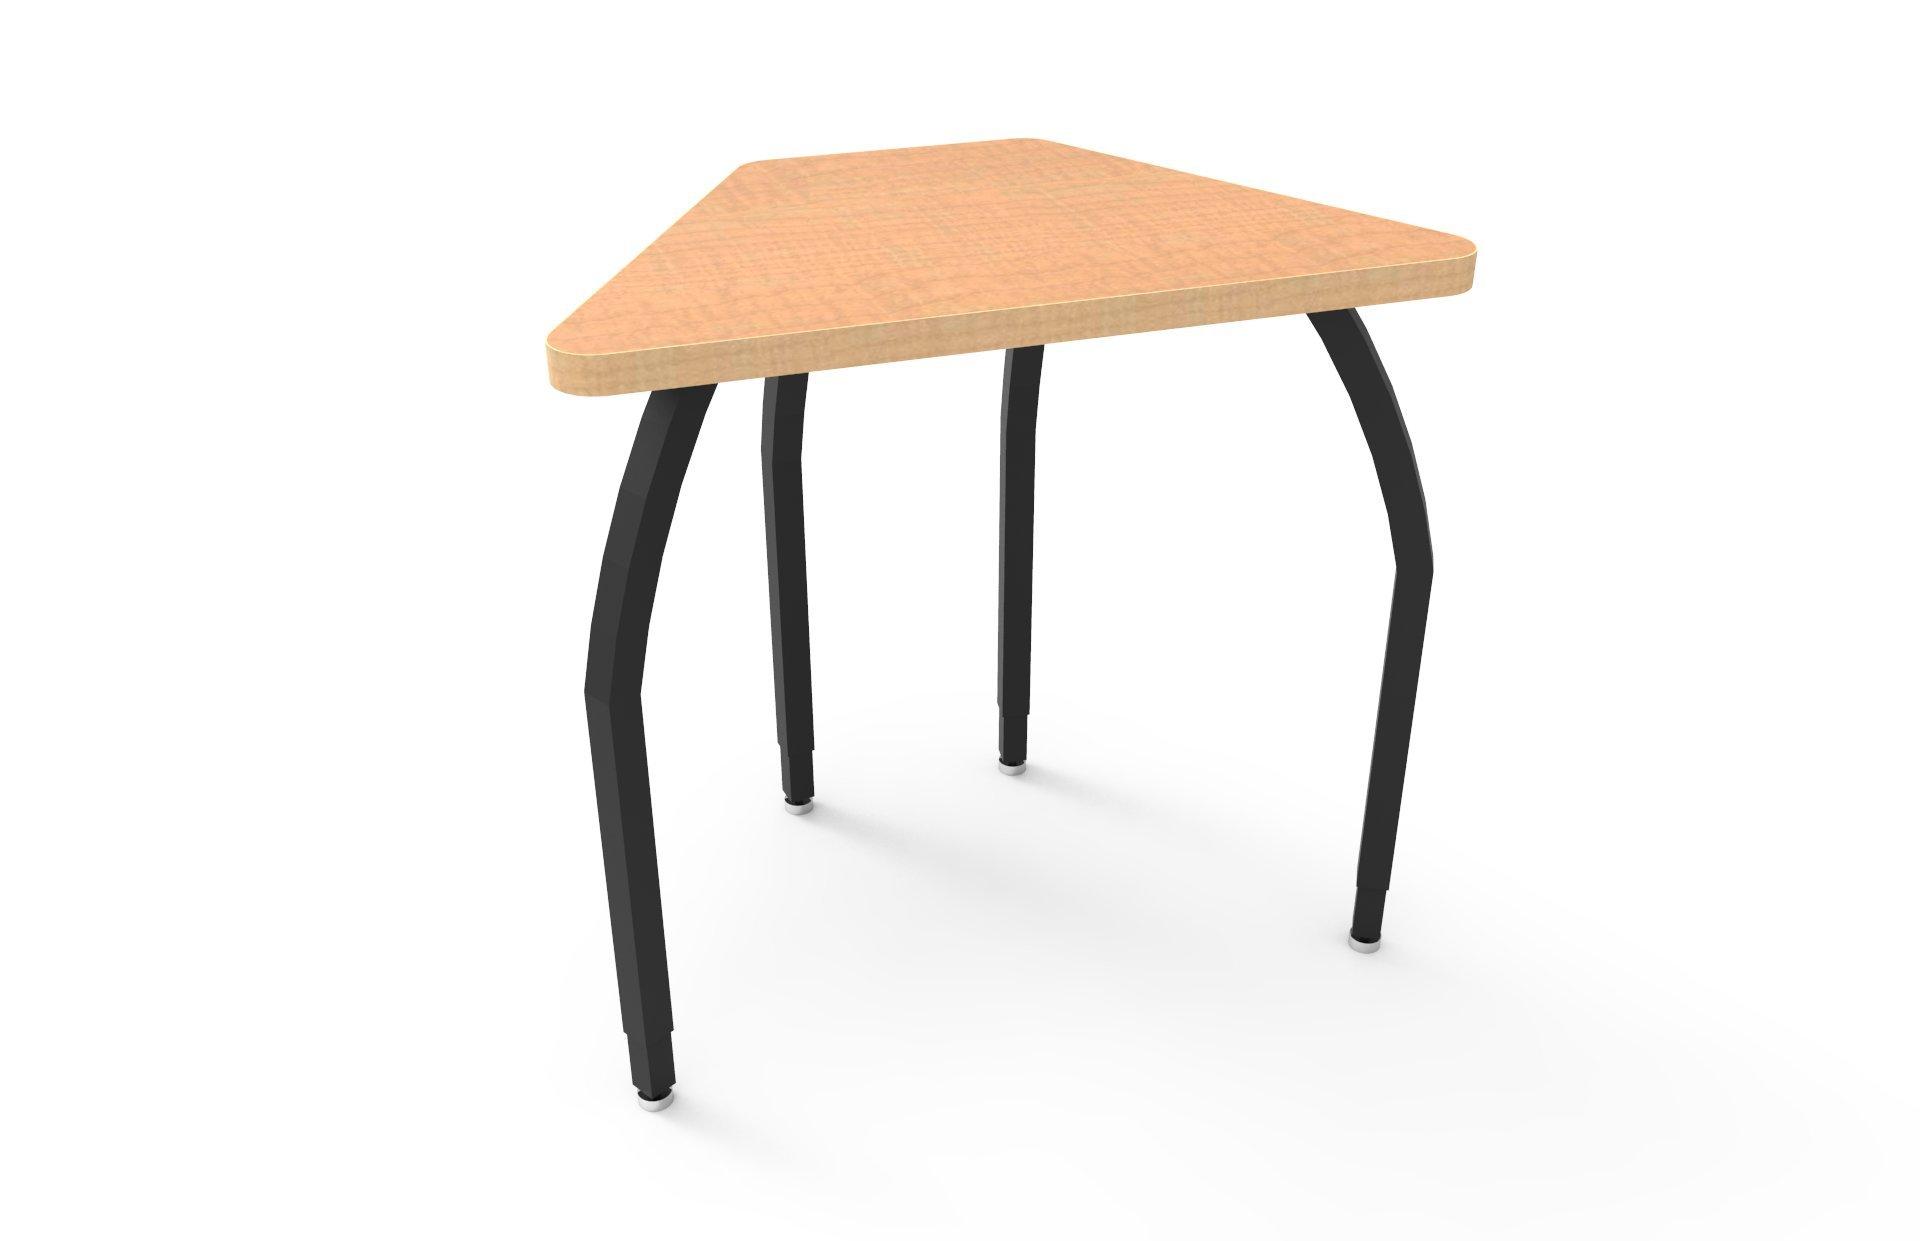 ELO Connect 6 desk, Fusion Maple laminate & banding w/4 adjustable black legs